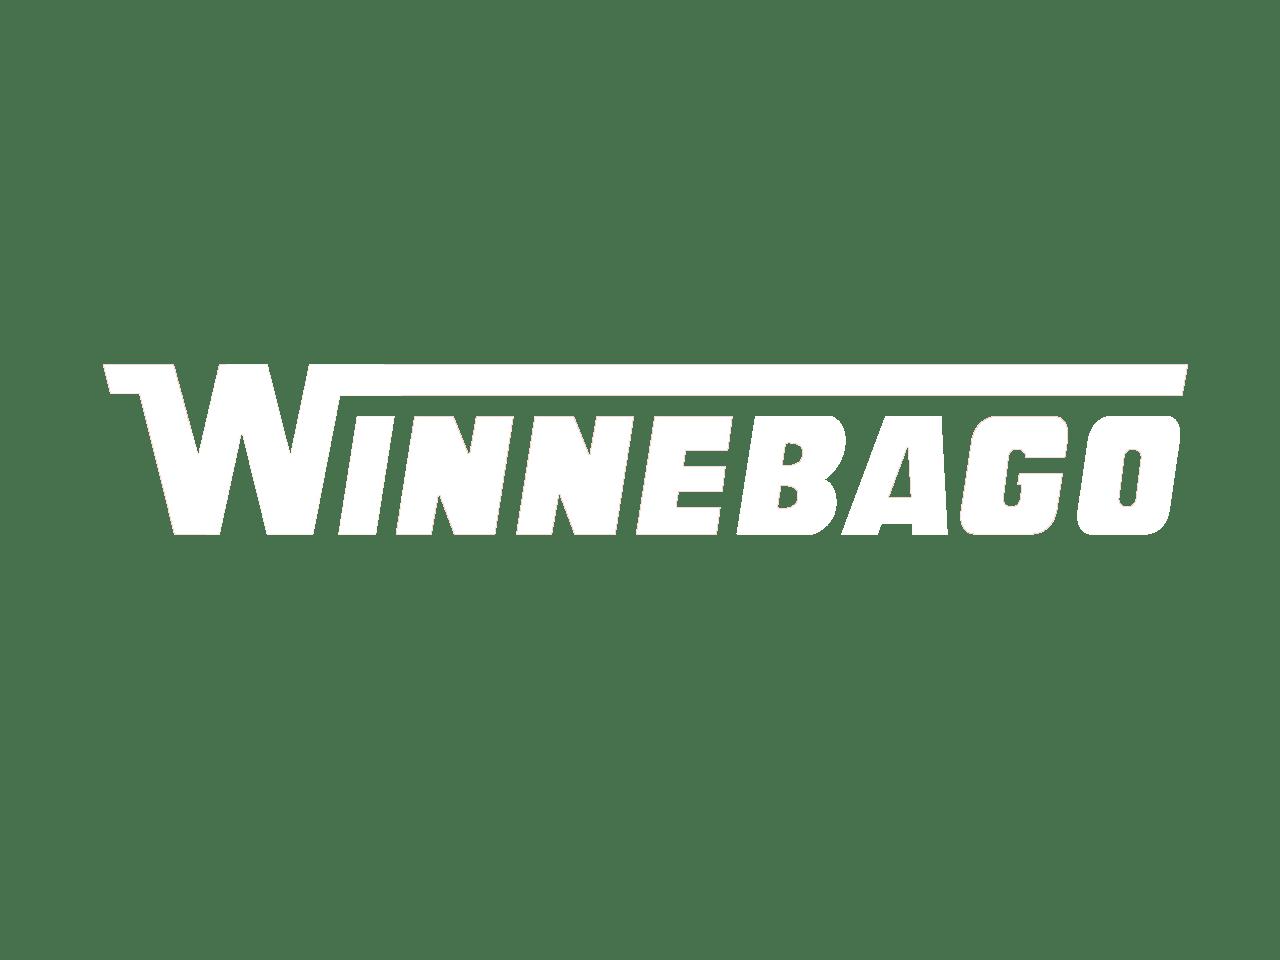 winnebago-white